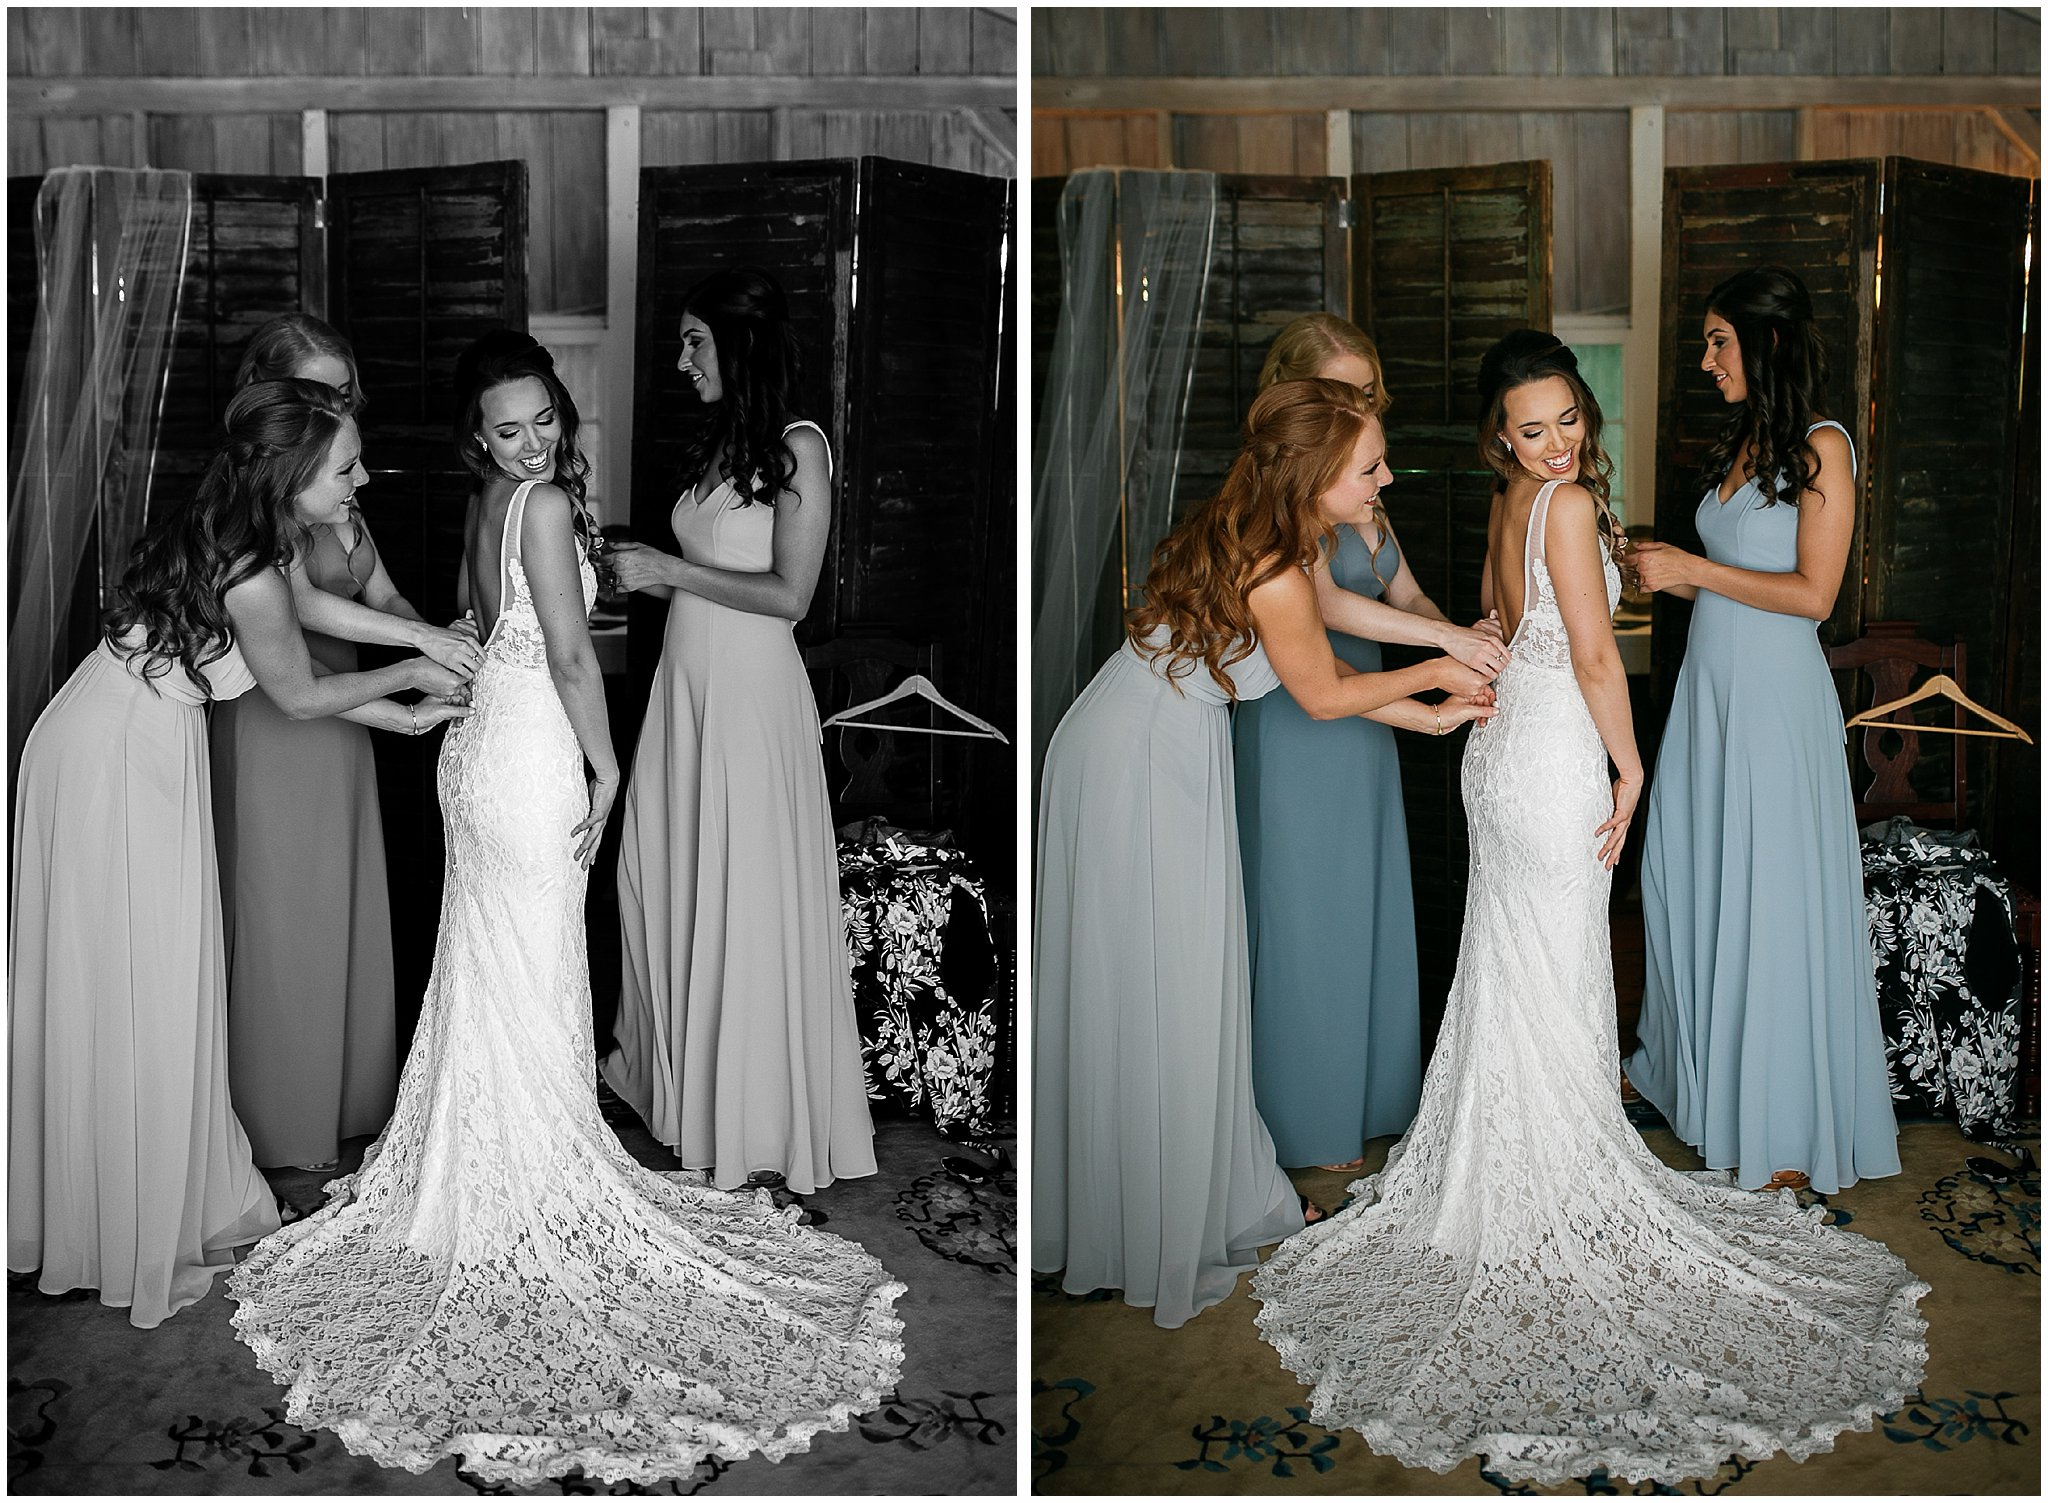 Hudson Valley Weddings at the Hill Hudson New York Wedding Photographer27.jpg